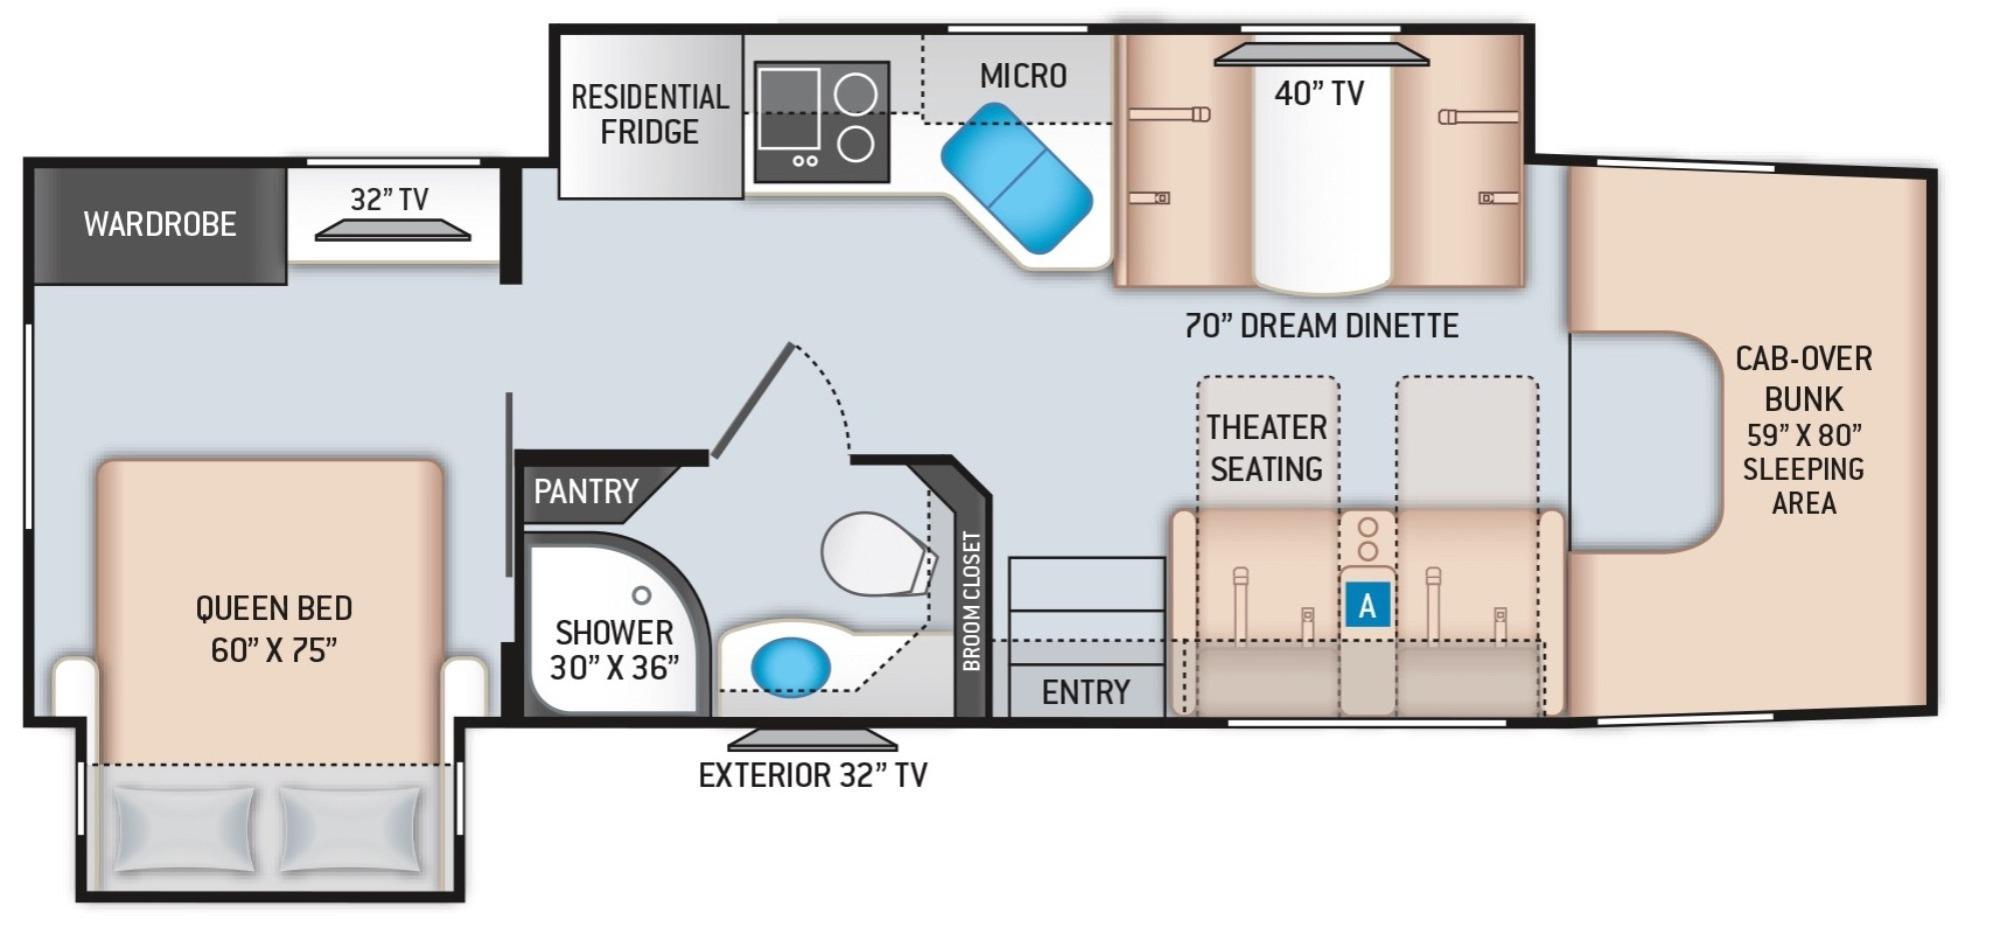 View Floor Plan for 2022 THOR MAGNITUDE XG32